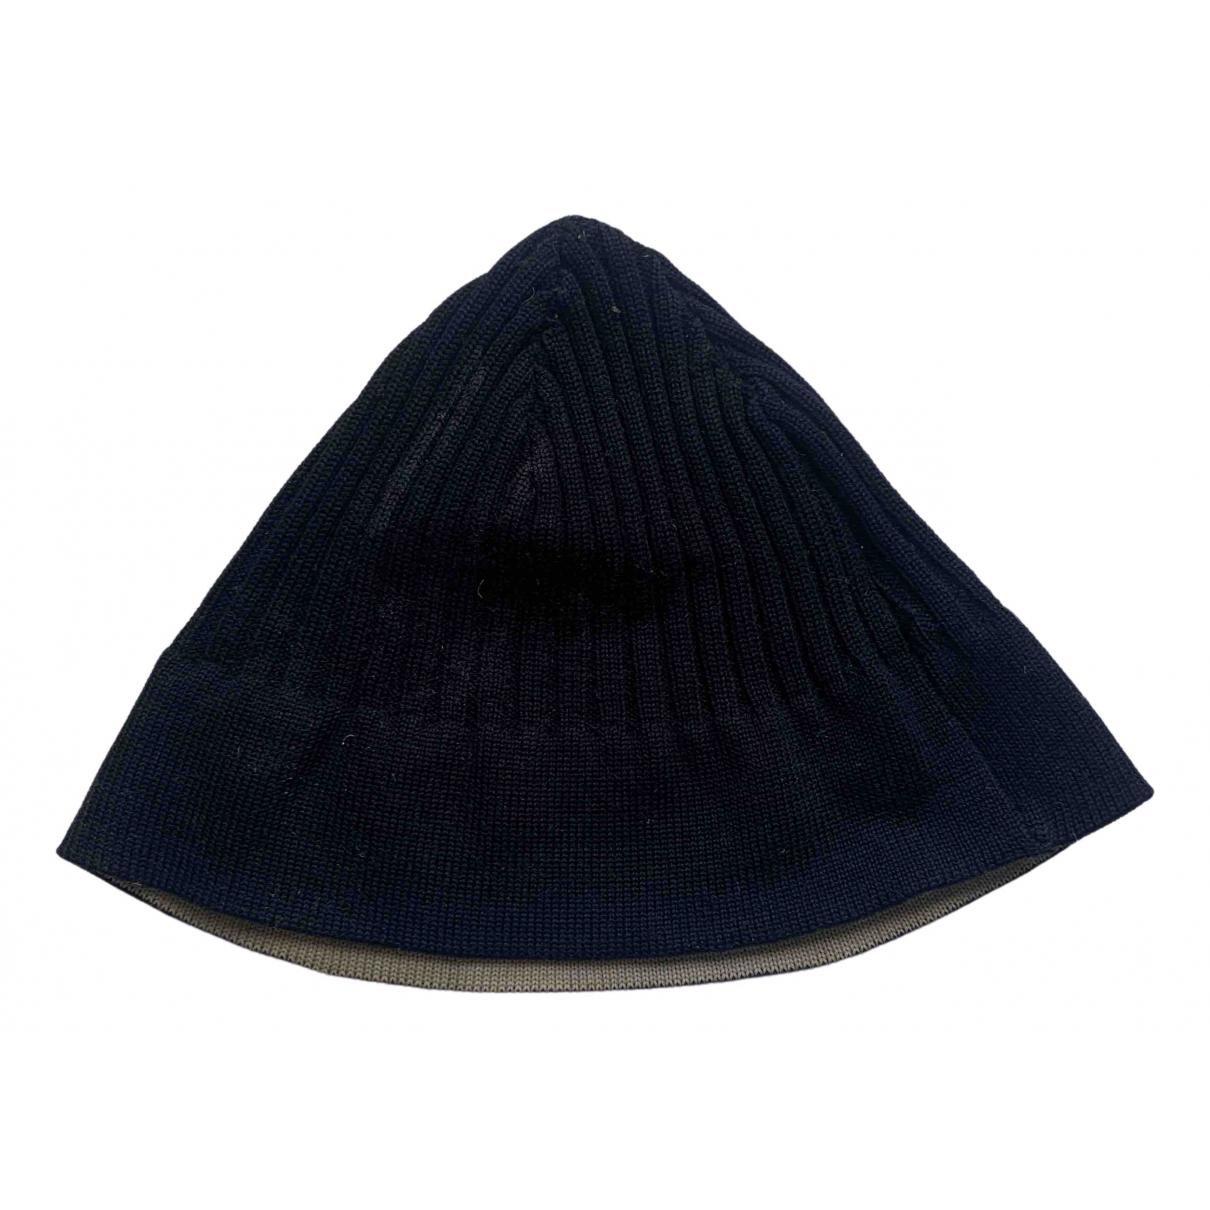 Emporio Armani \N Navy Wool hat & pull on hat for Men S International